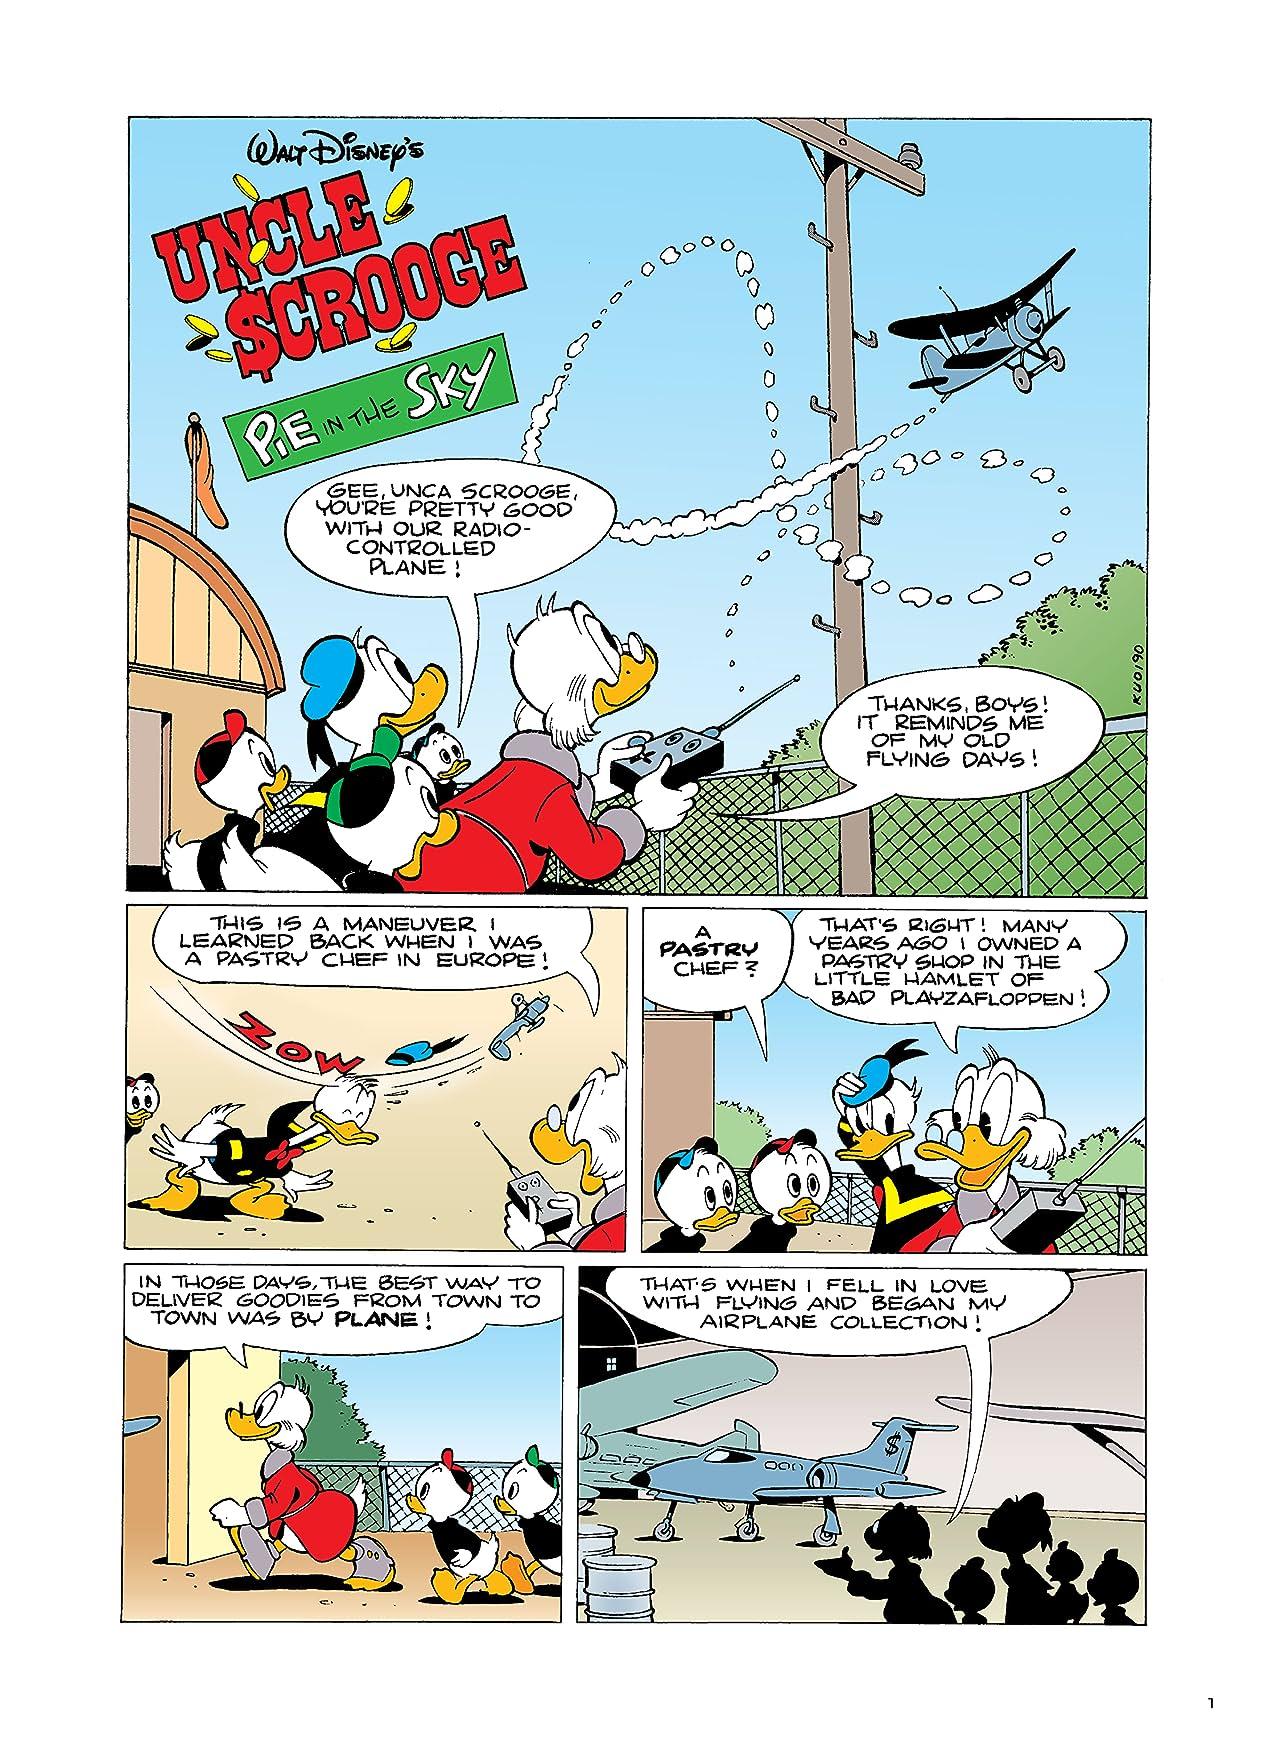 Disney Masters Vol. 18: Donald Duck: Pie in the Sky